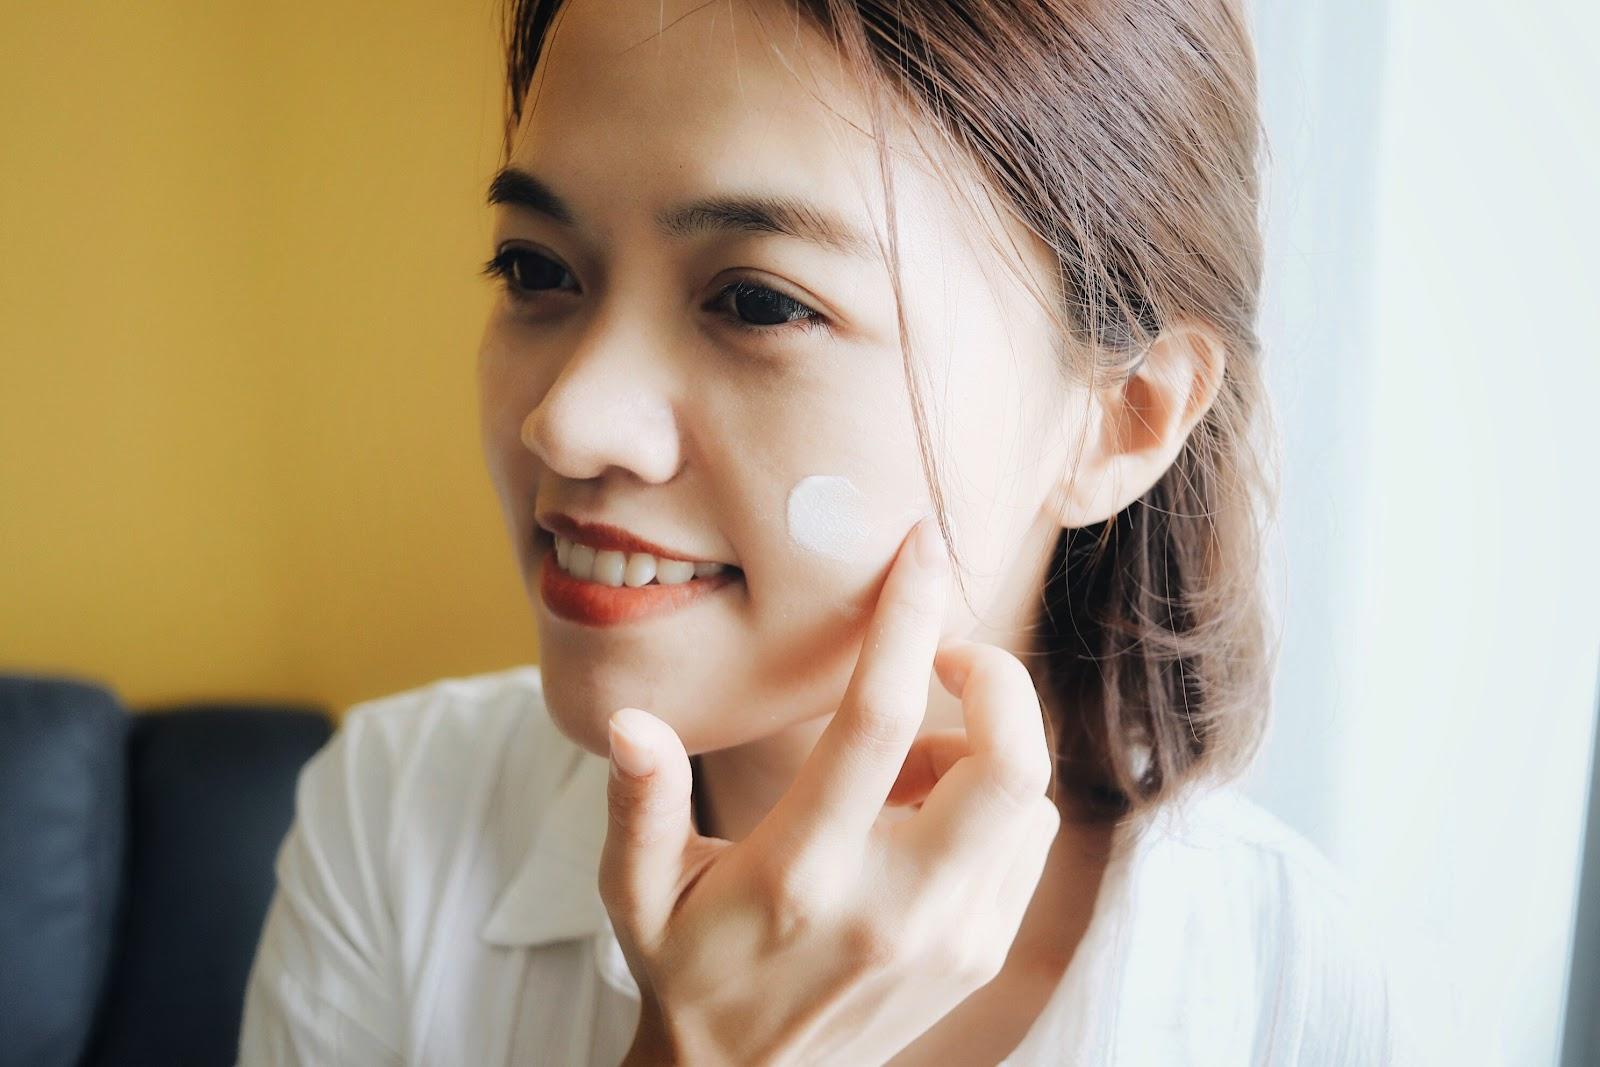 Moisturizing in skincare routine